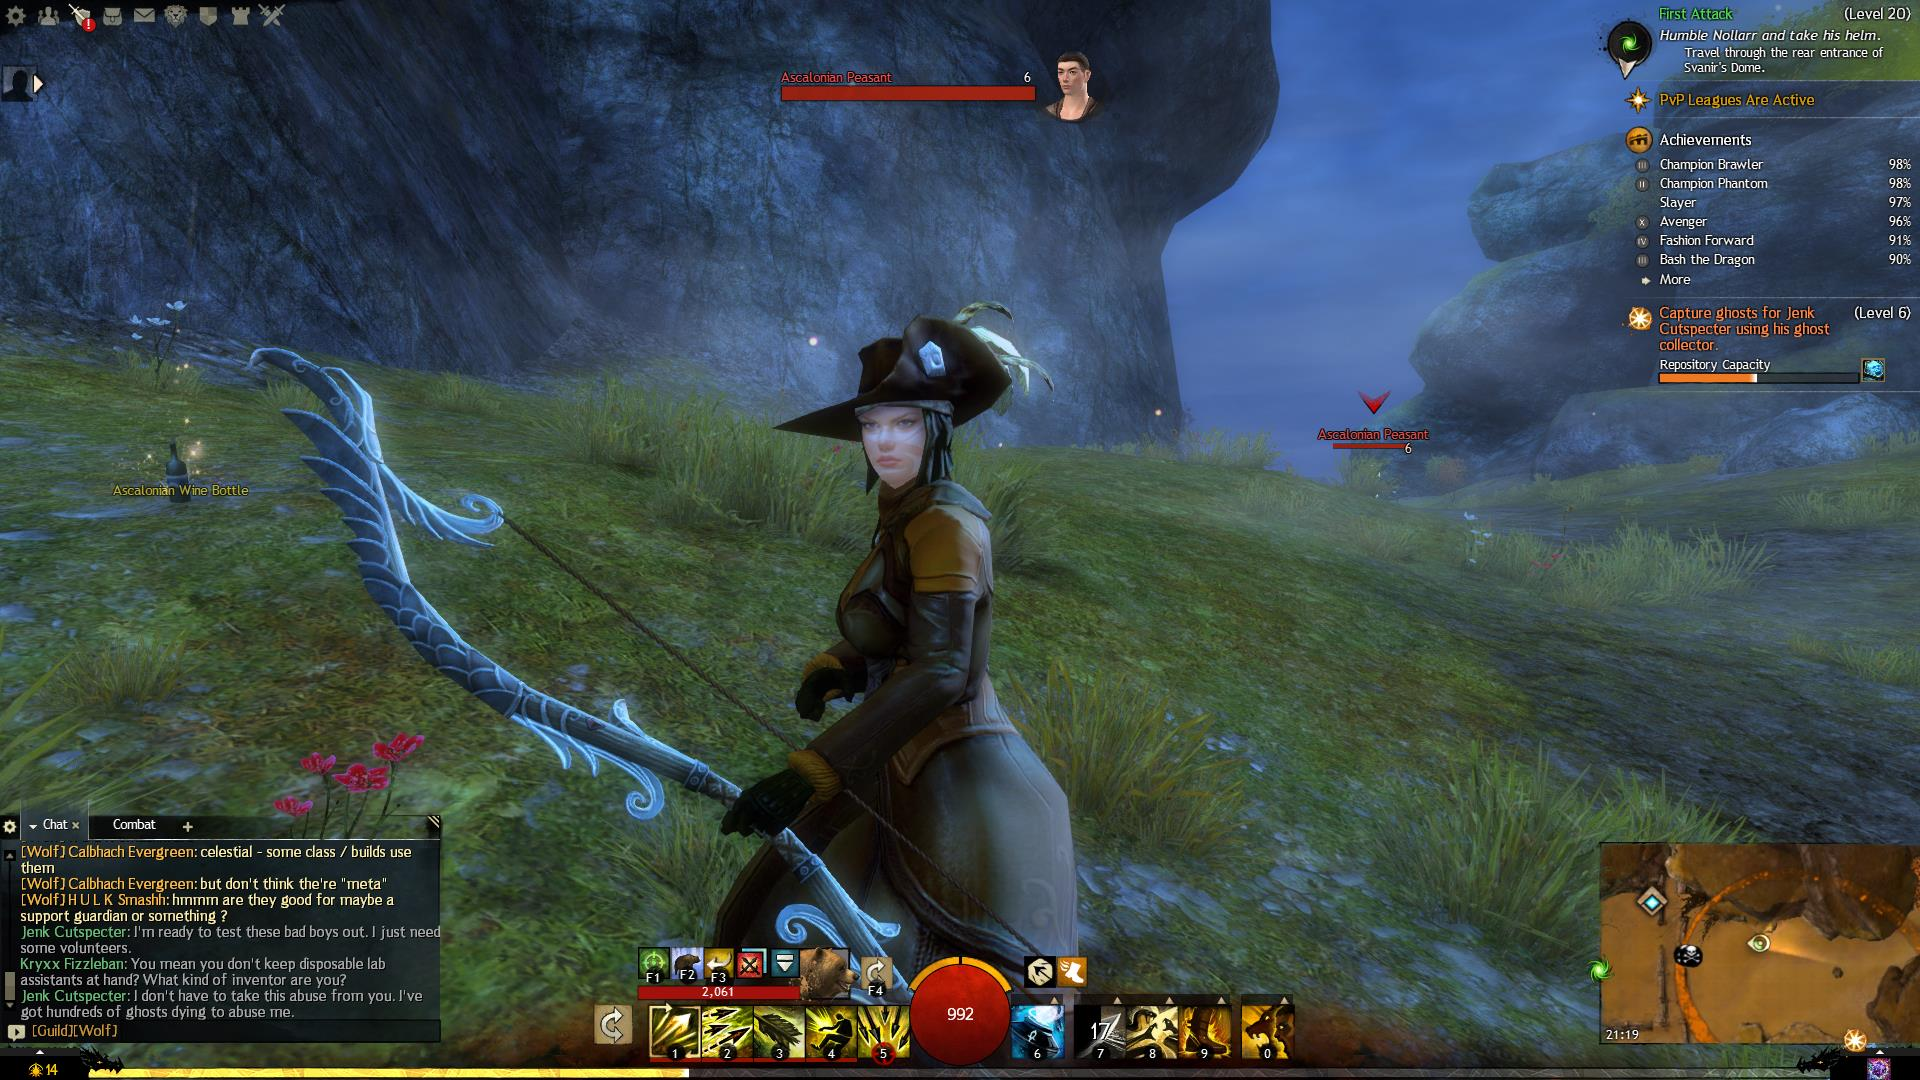 Guild Wars 2 Ranger screenshot